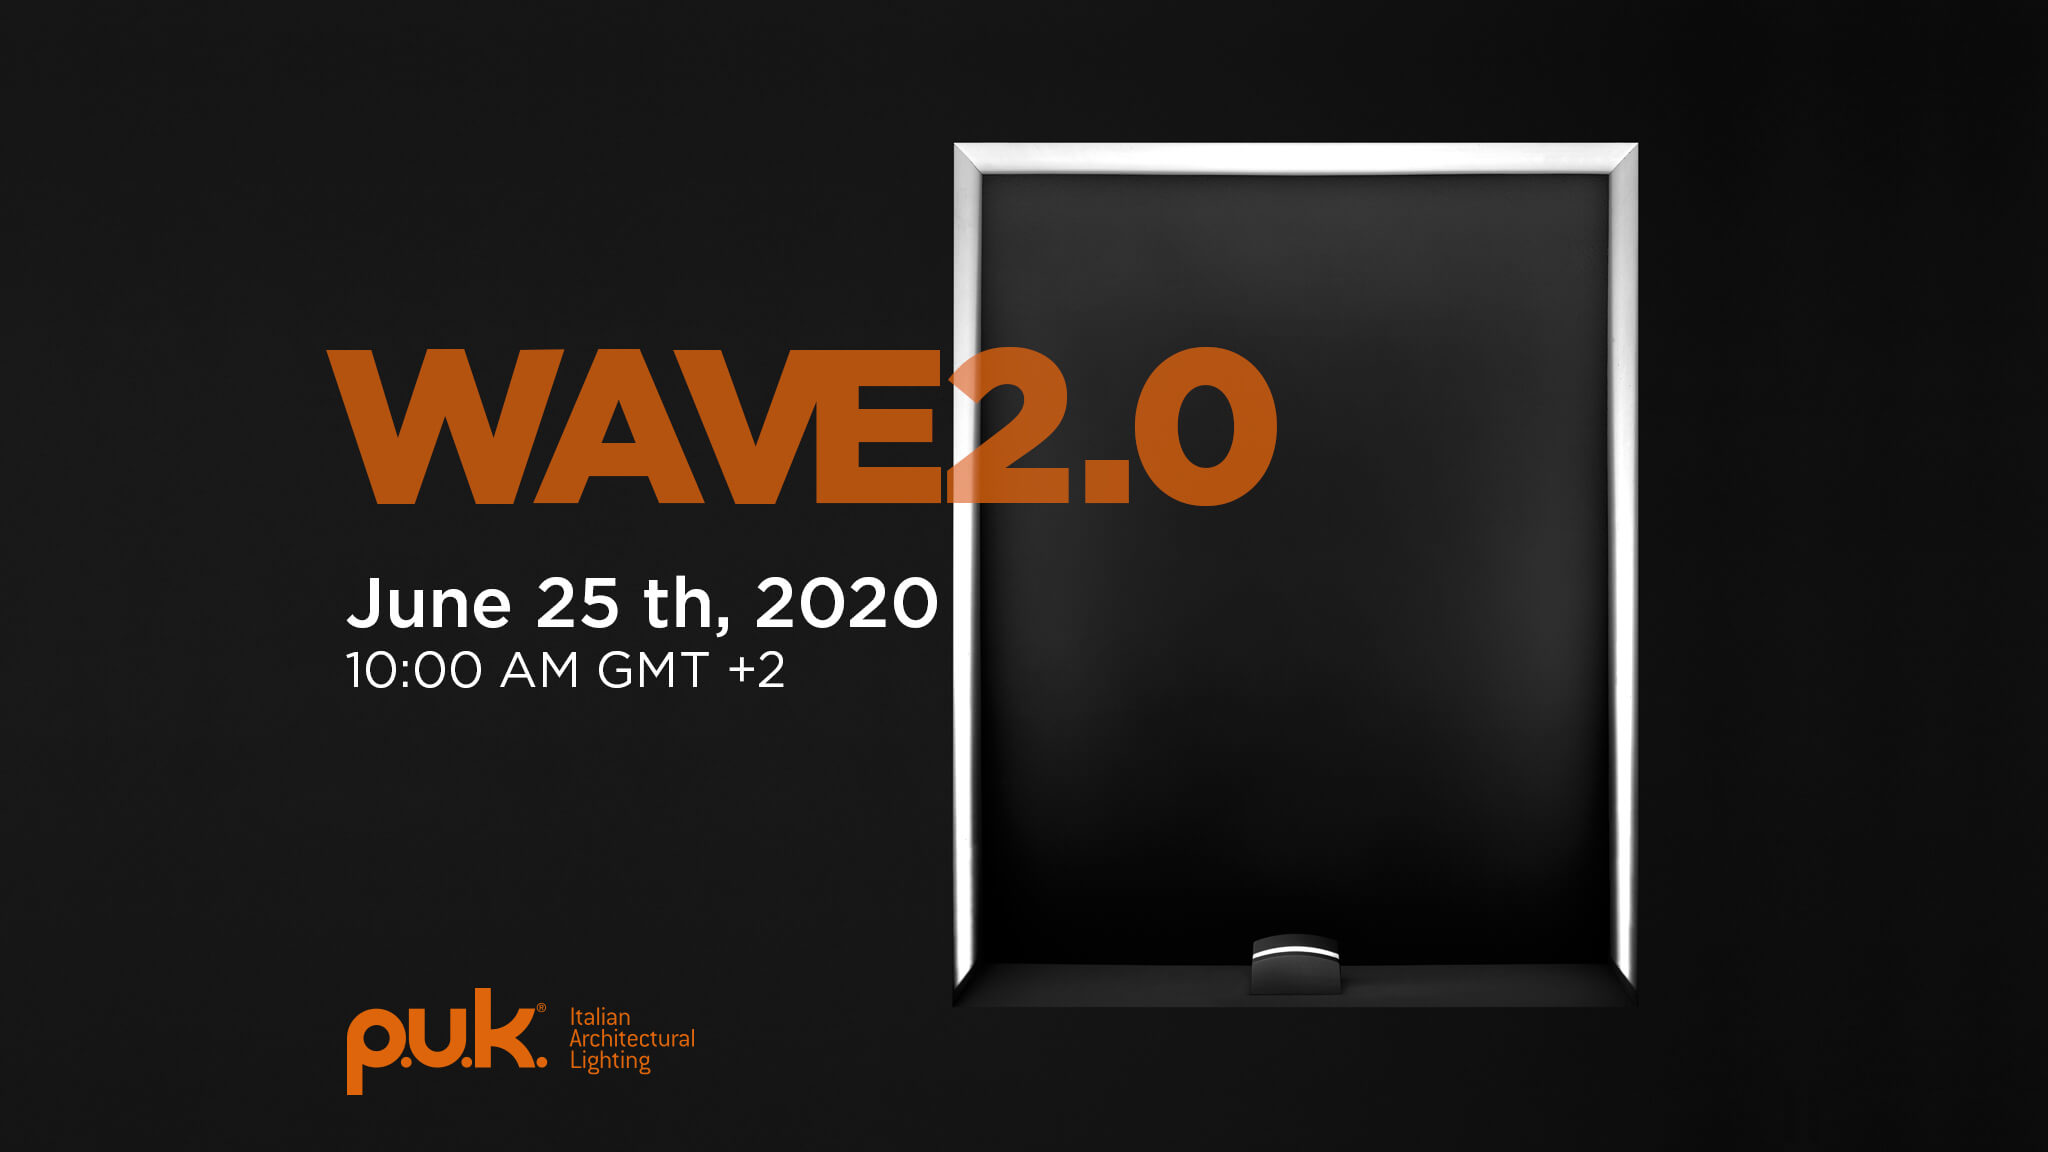 Webinar Wave 2.0